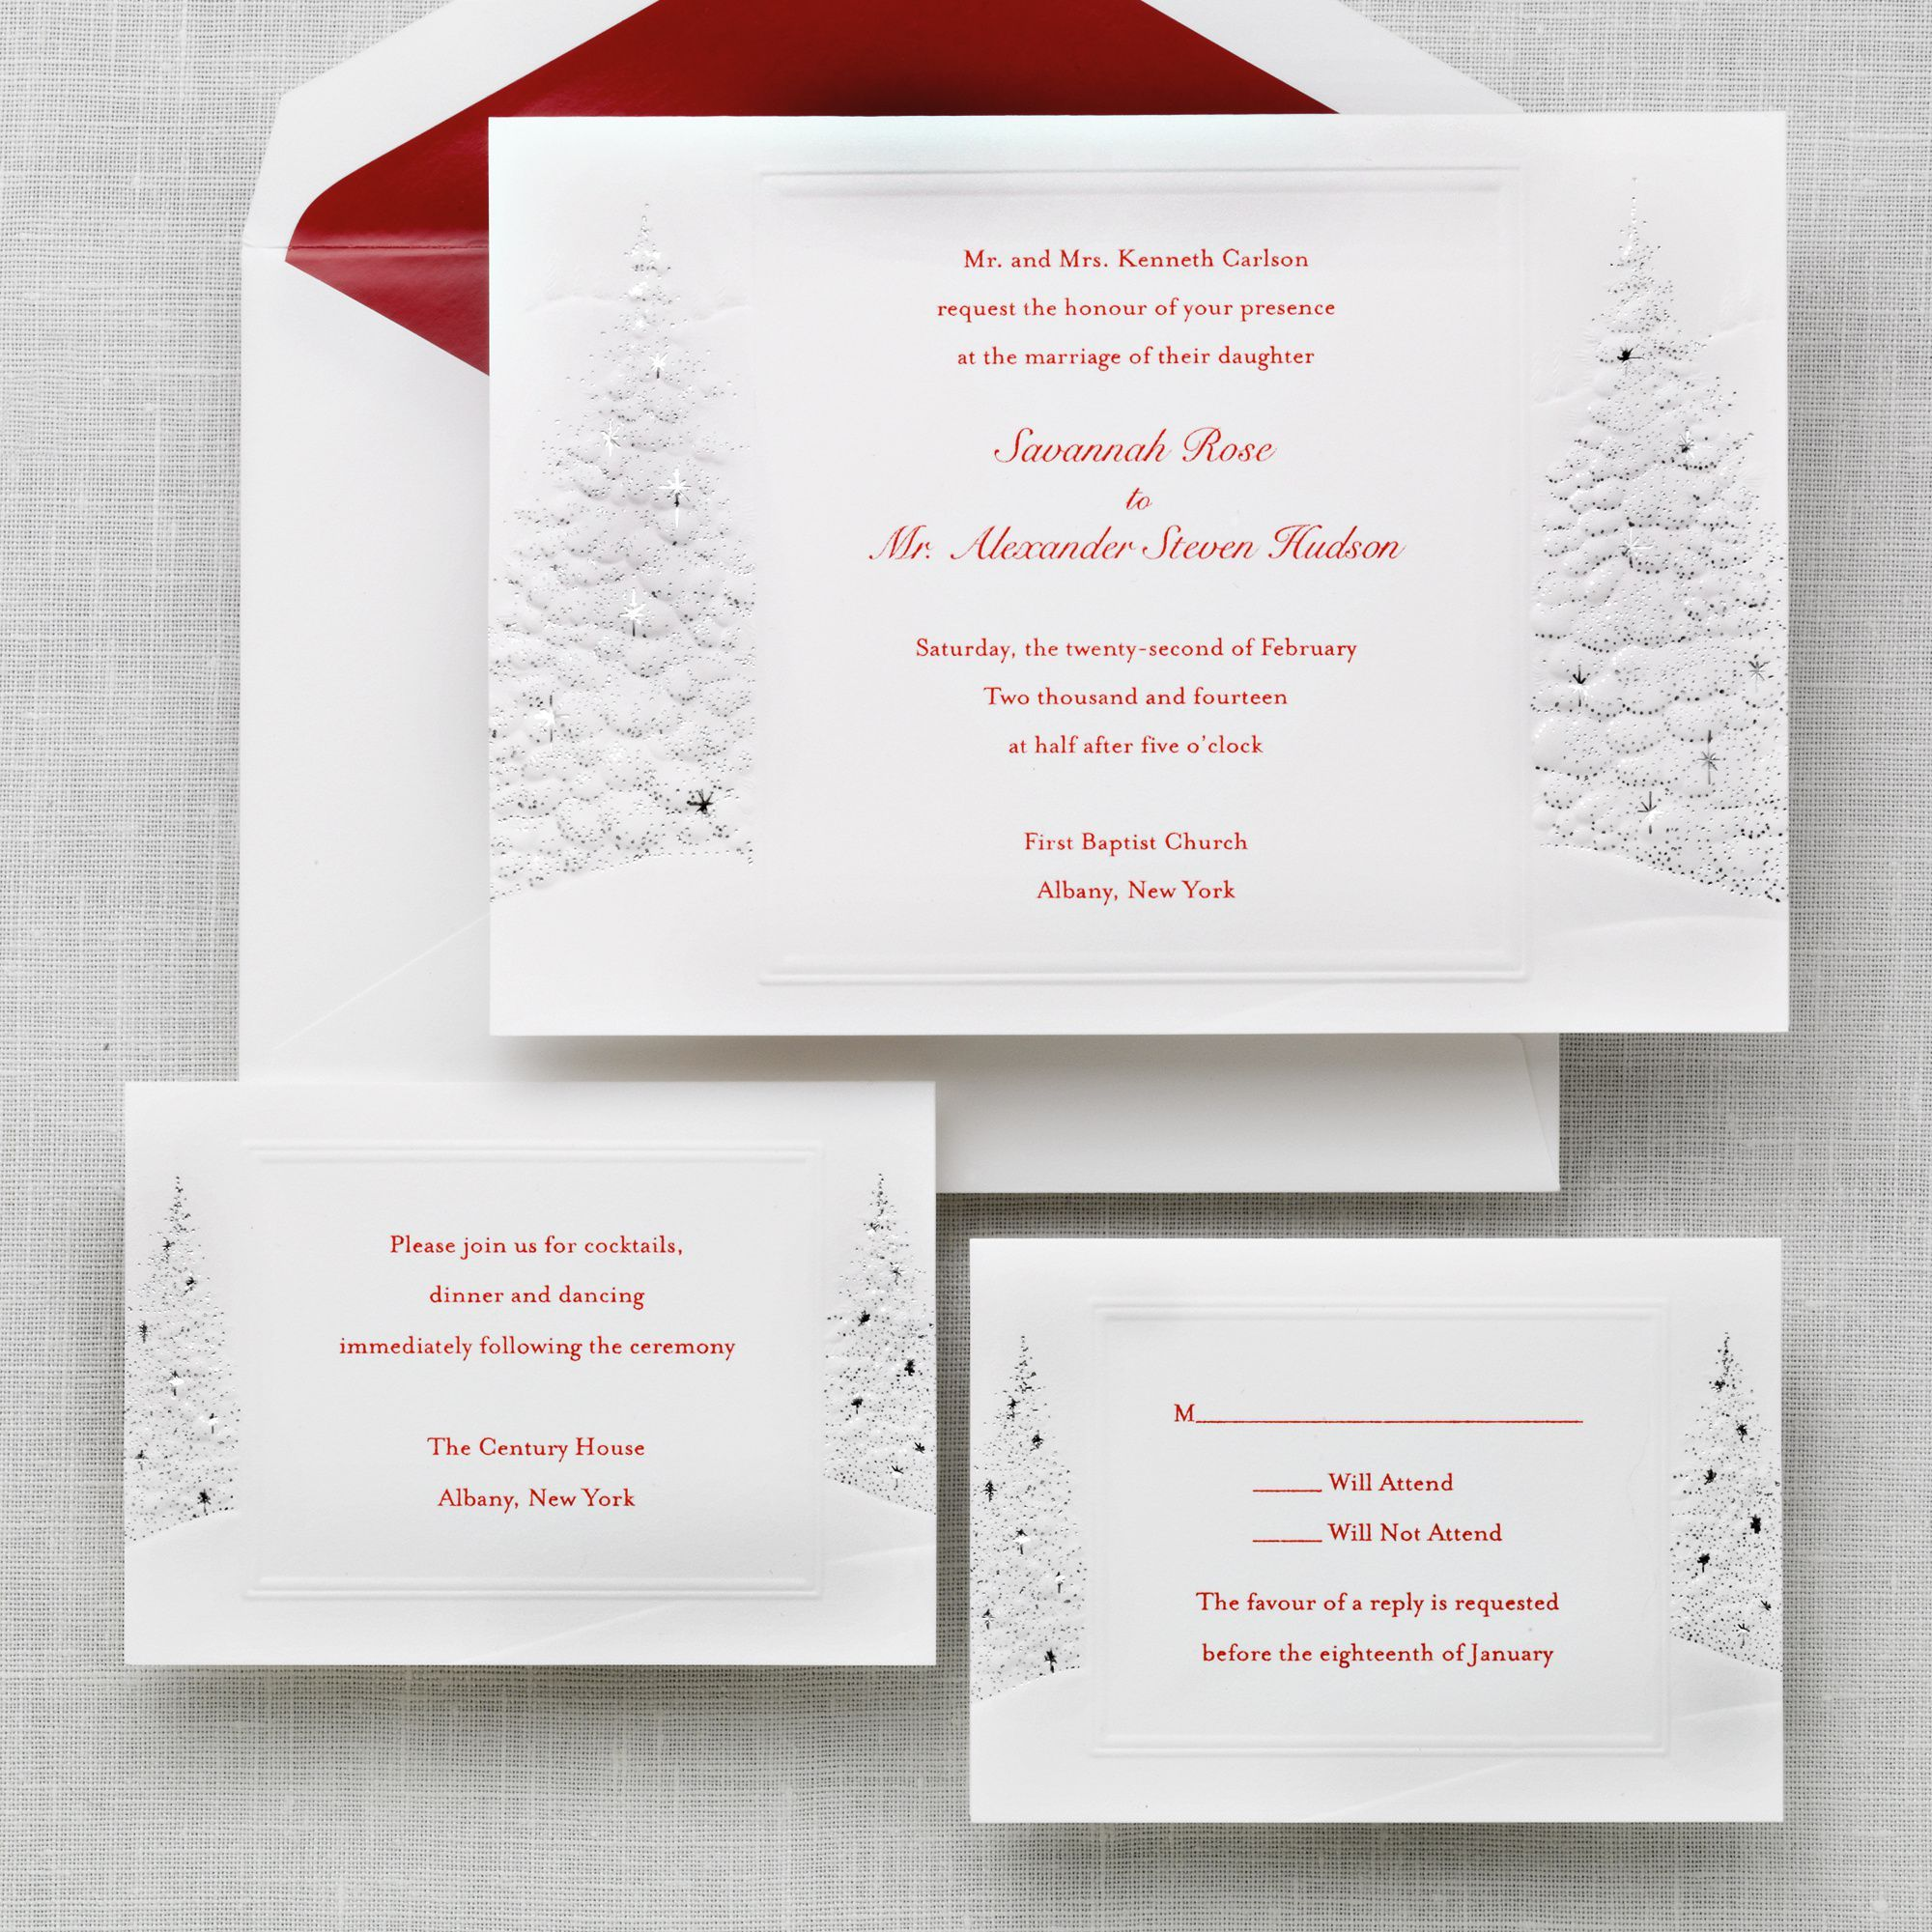 Save money on craft supplies. The Ethics Of Standard Wedding Invitation Size Free Smart Design Weddi Standard Wedding Invitation Size Wedding Invitation Size Christmas Wedding Invitations